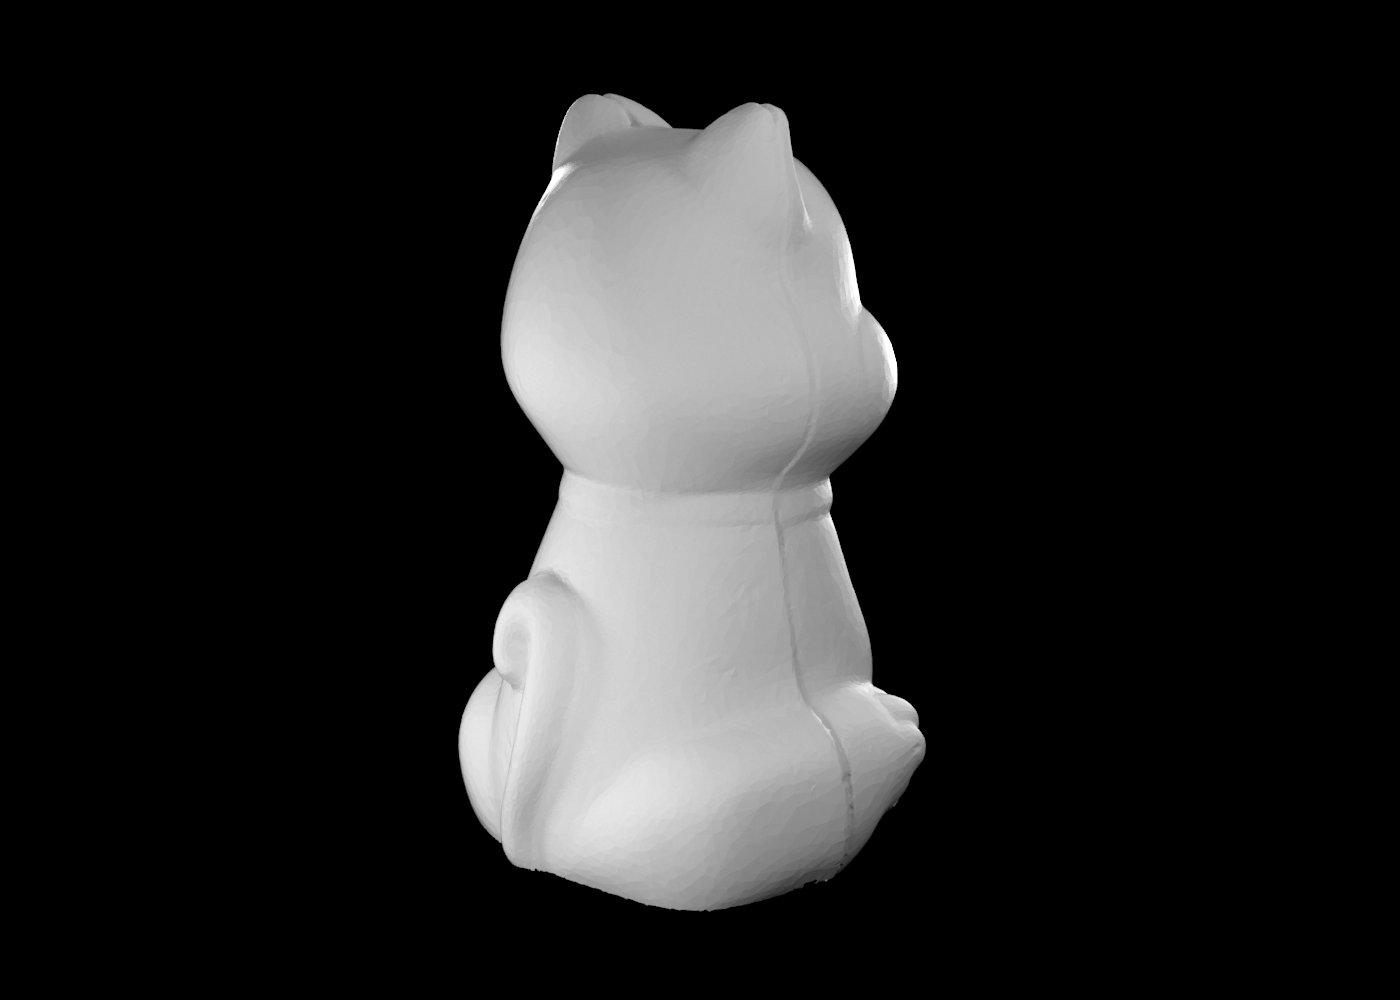 reverse engineering statua gatto 4